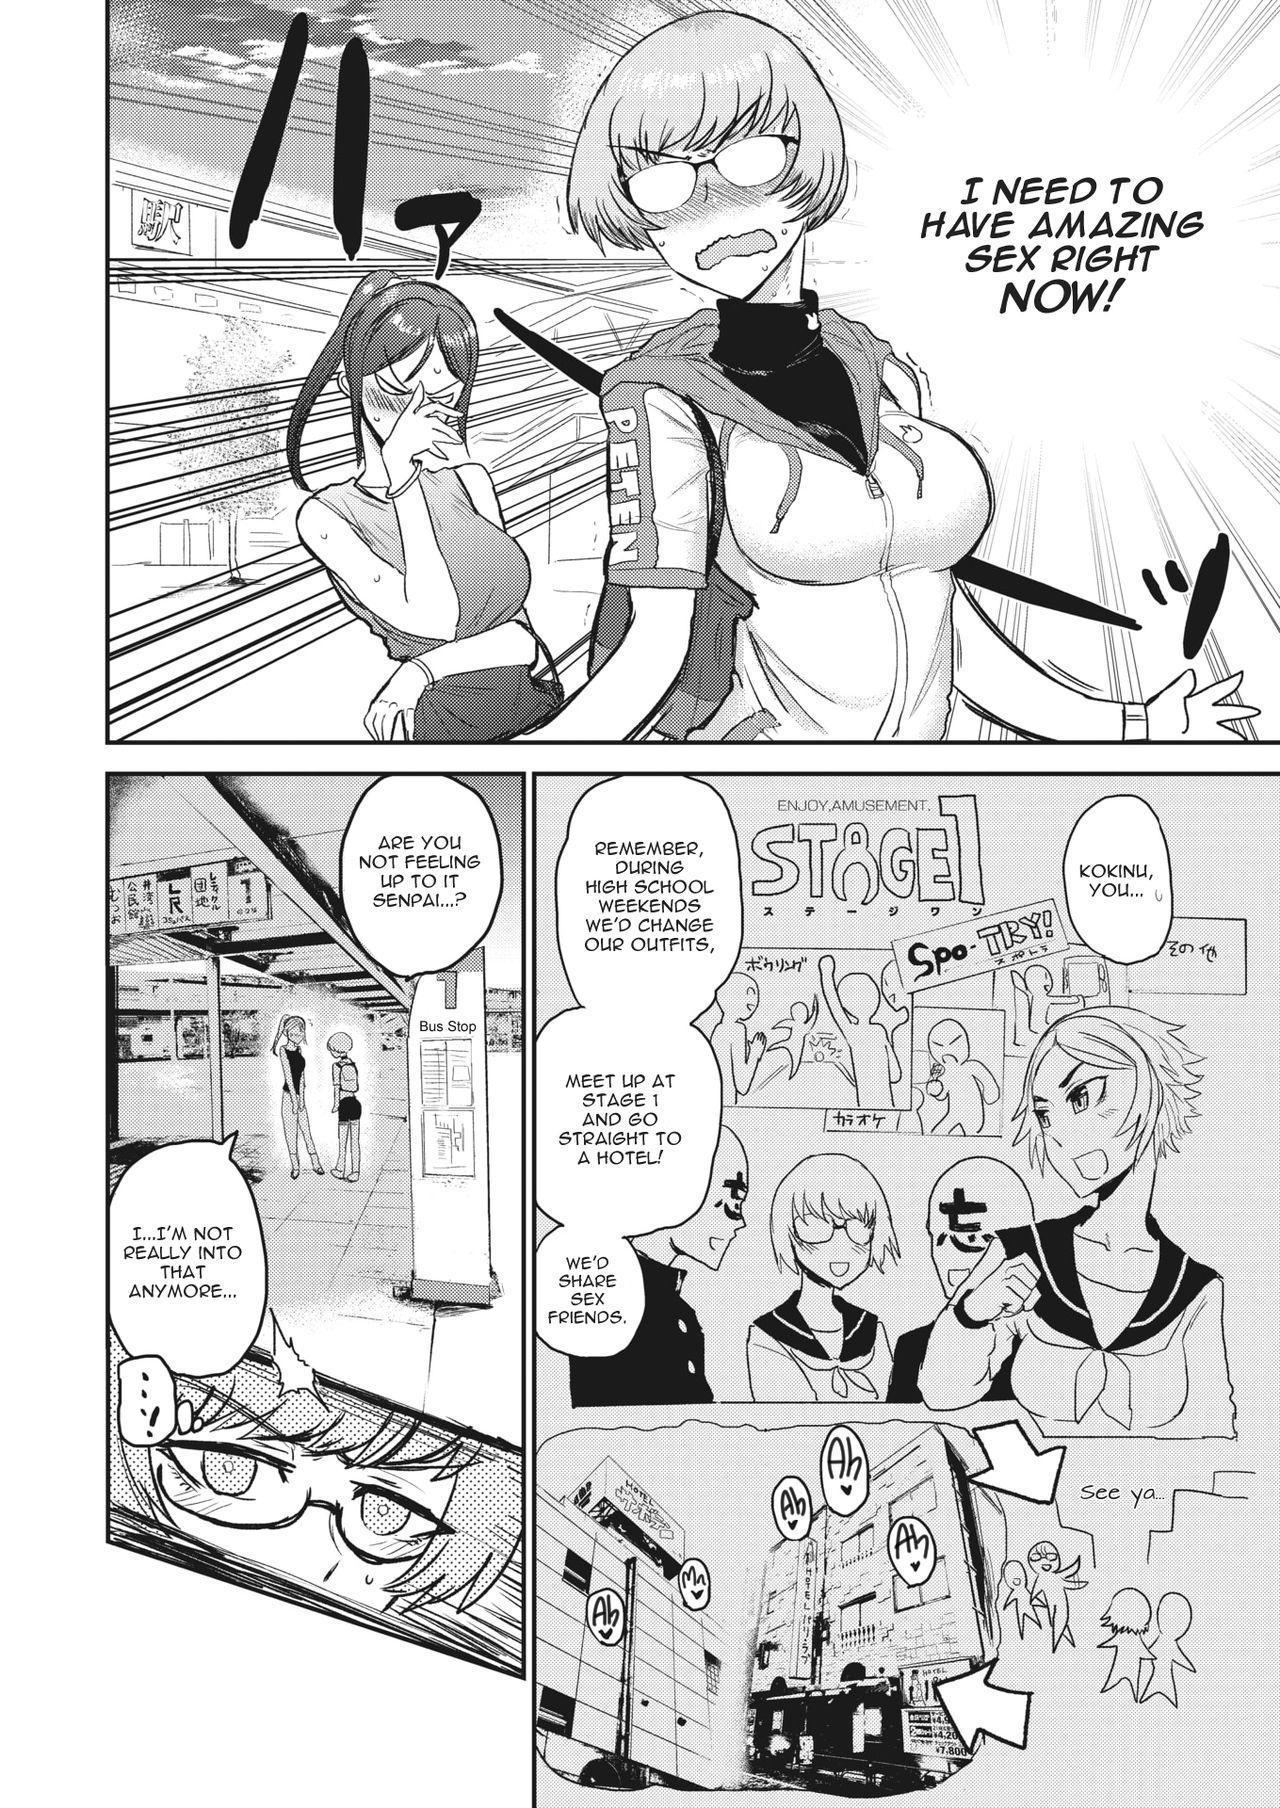 [ICHIGAIN] Tokihanatsu ~I am a top of breeder!~ | Let Loose ~I am a top of breeder!~ (COMIC Kairakuten 2020-05) [English] [Moko_T] [Digital] 3